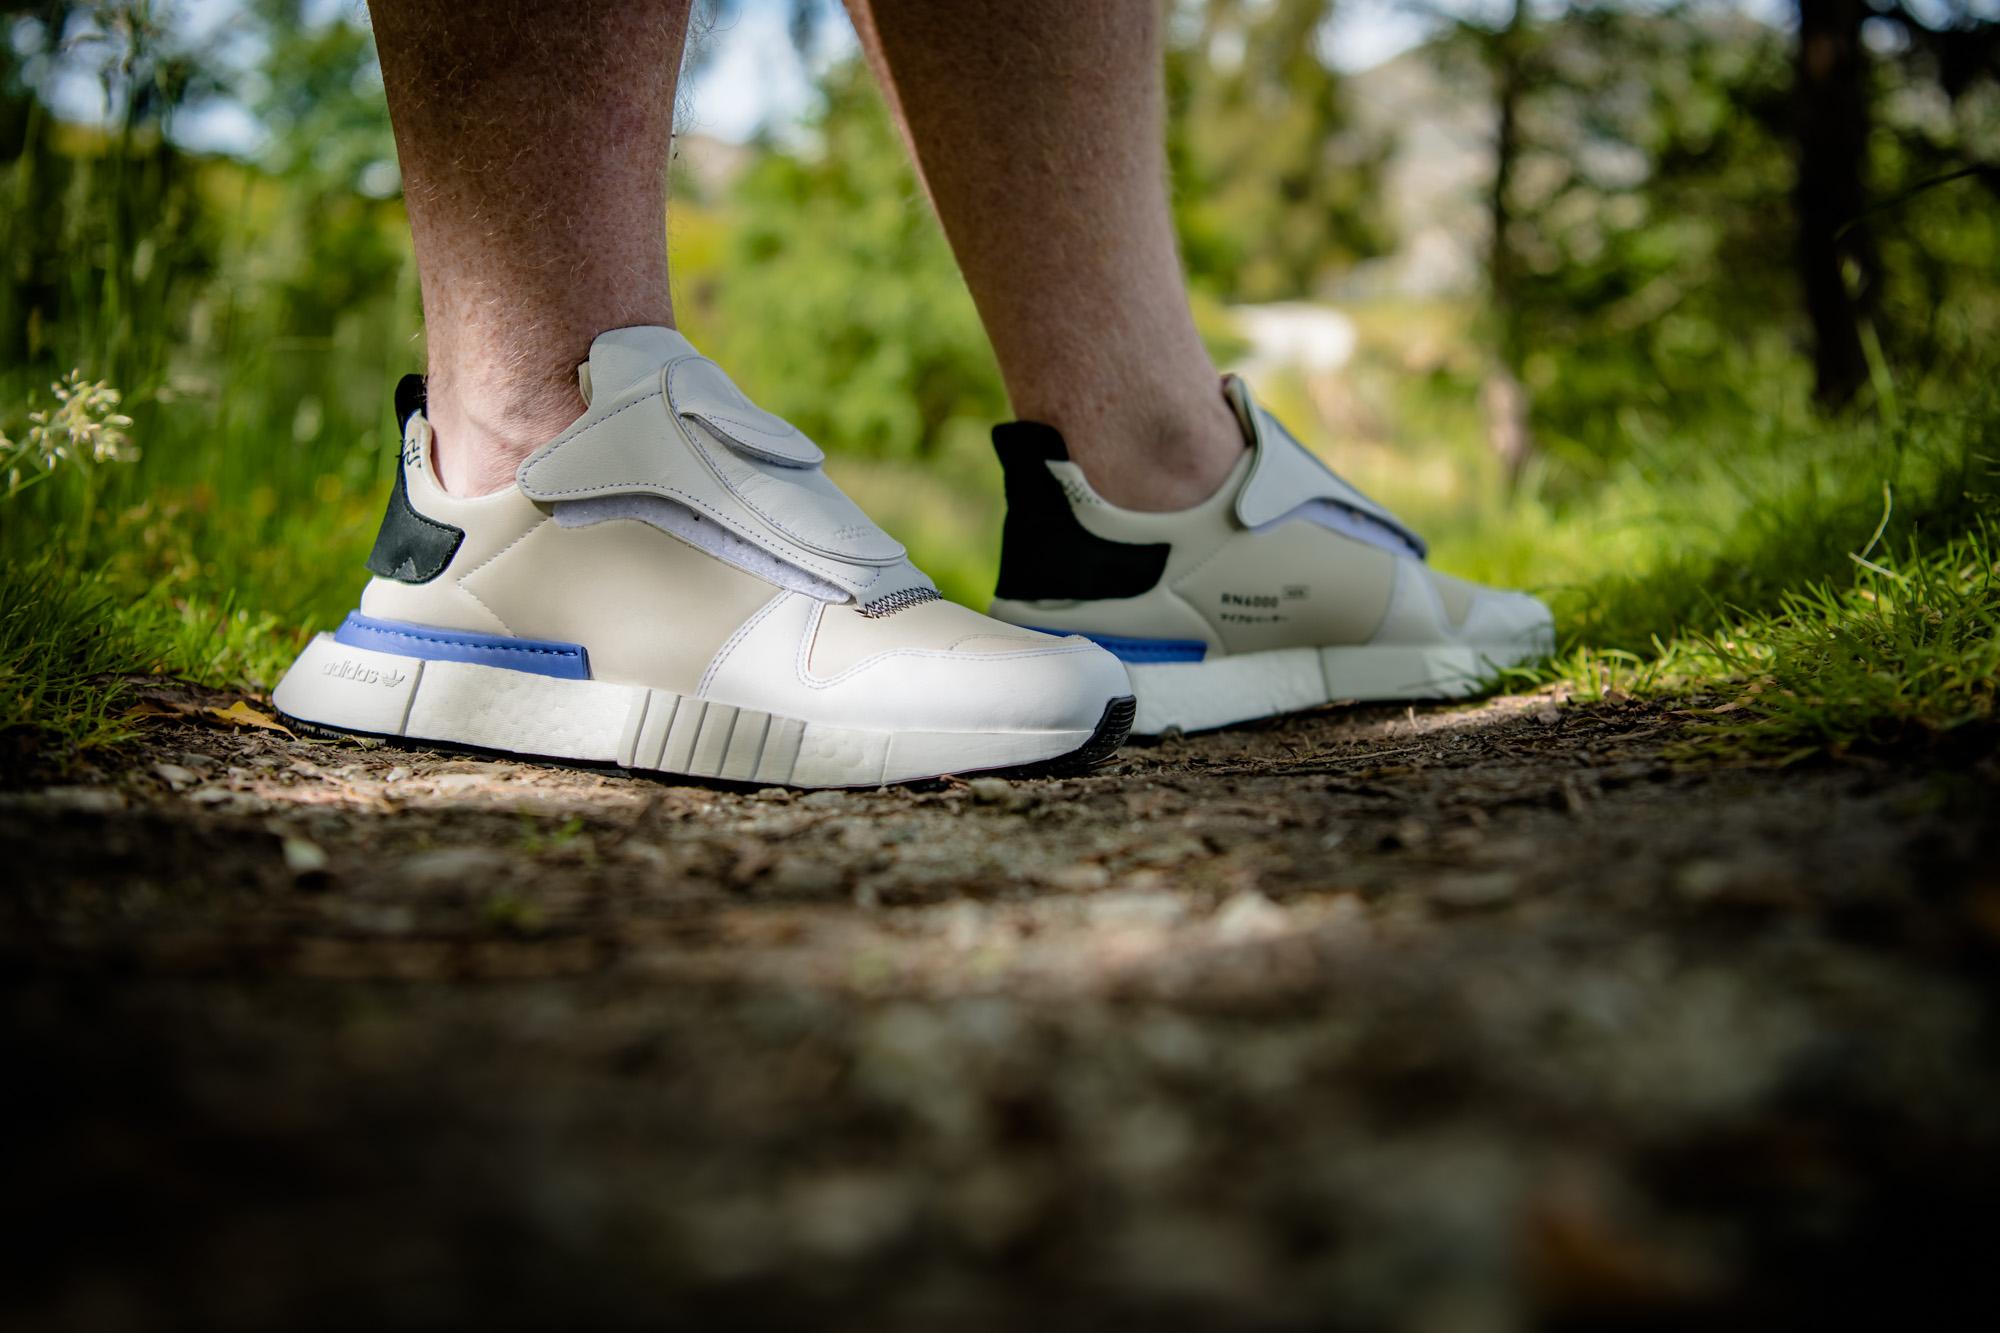 Adidas FuturePacer - Old school sneakerhead delight